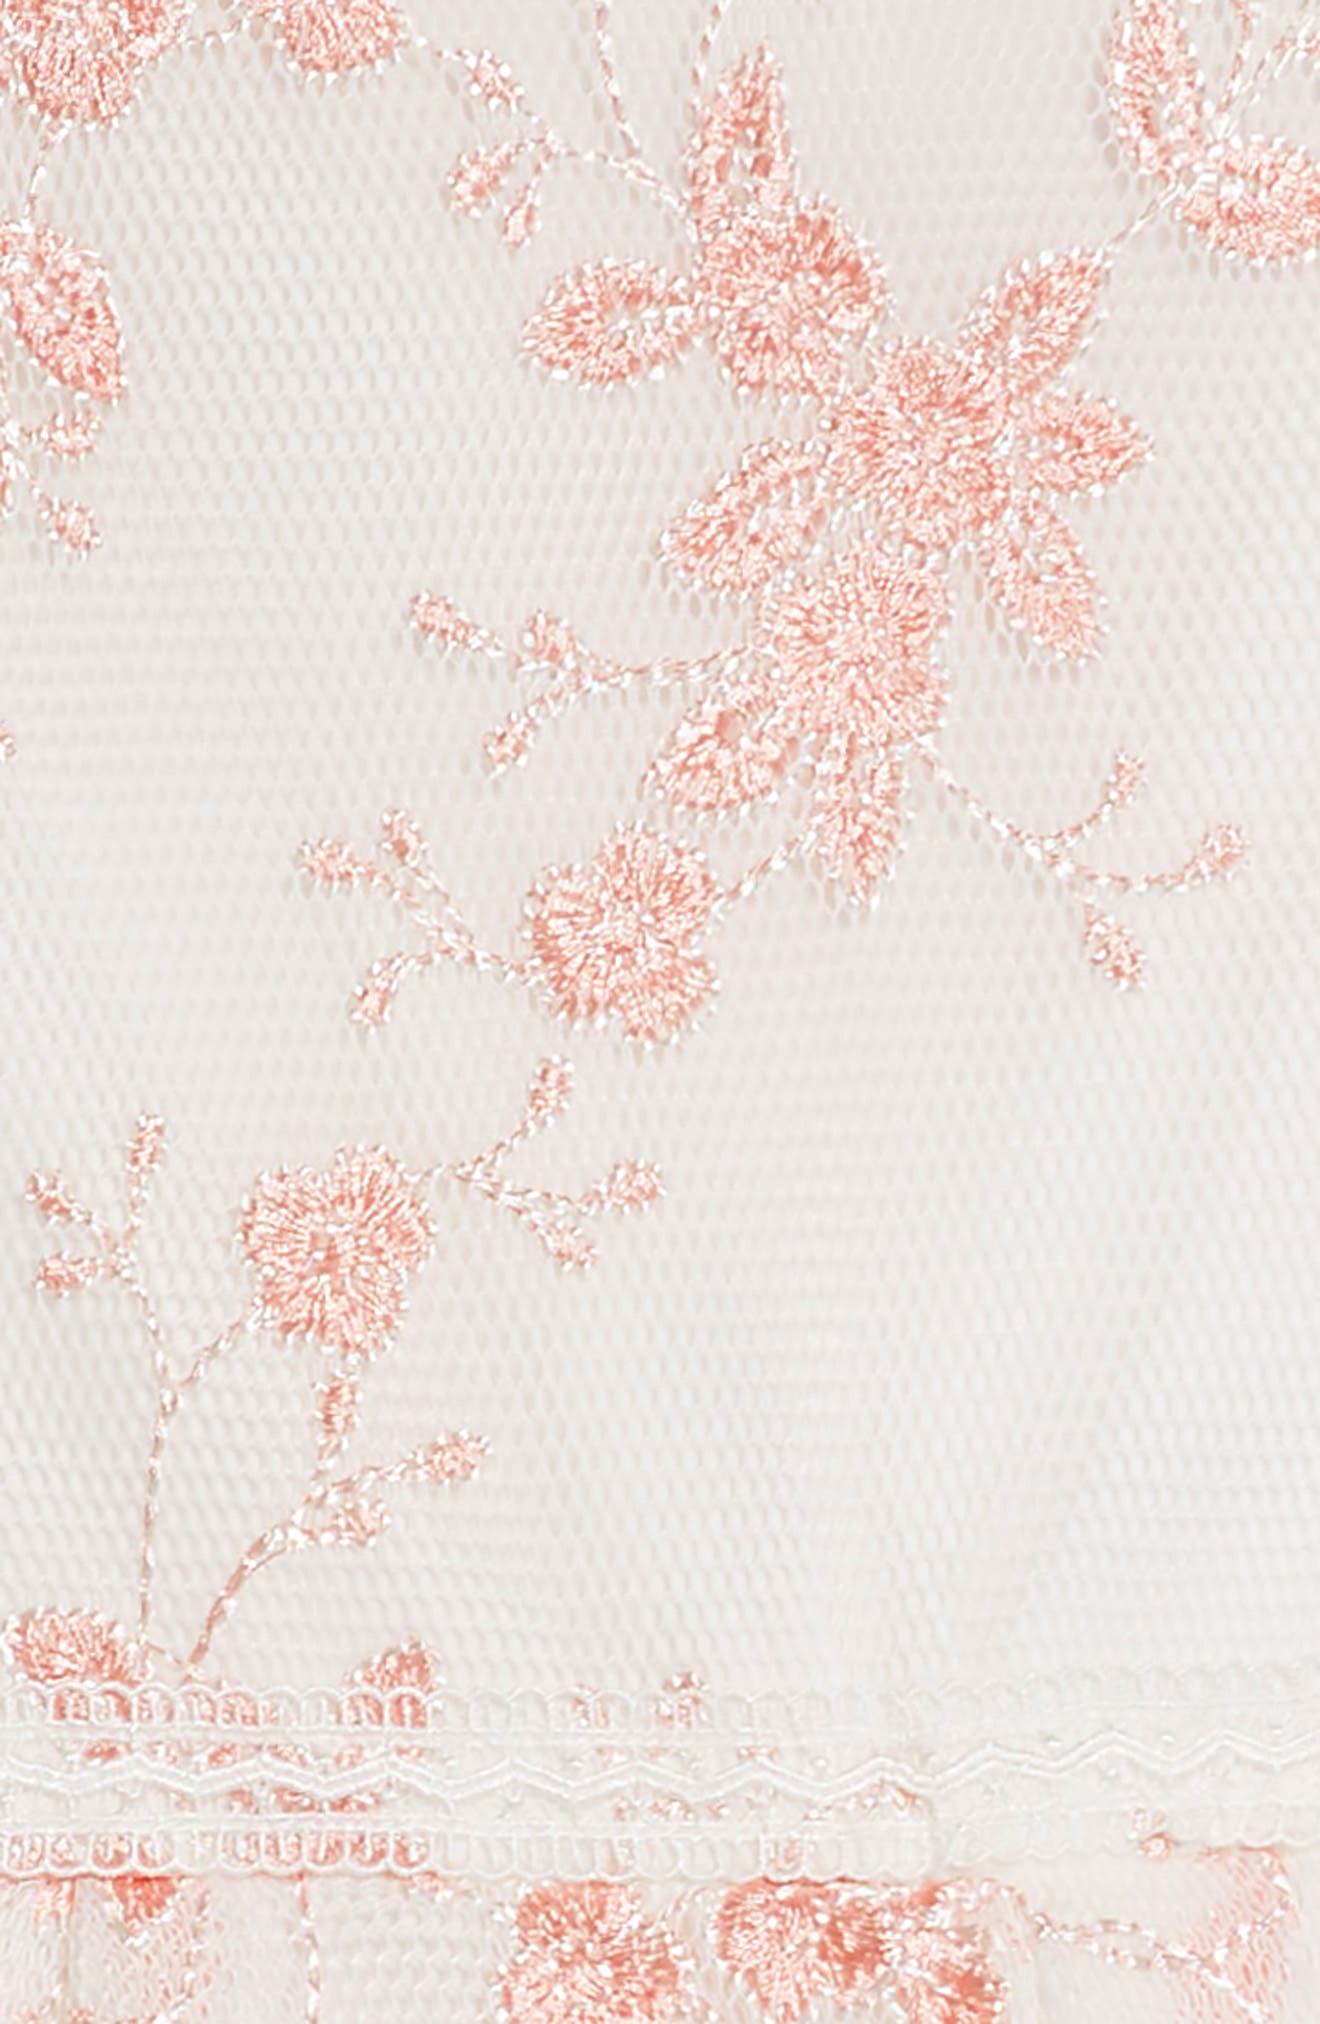 Embroidered Mesh Skater Dress,                             Alternate thumbnail 3, color,                             White/ Coral